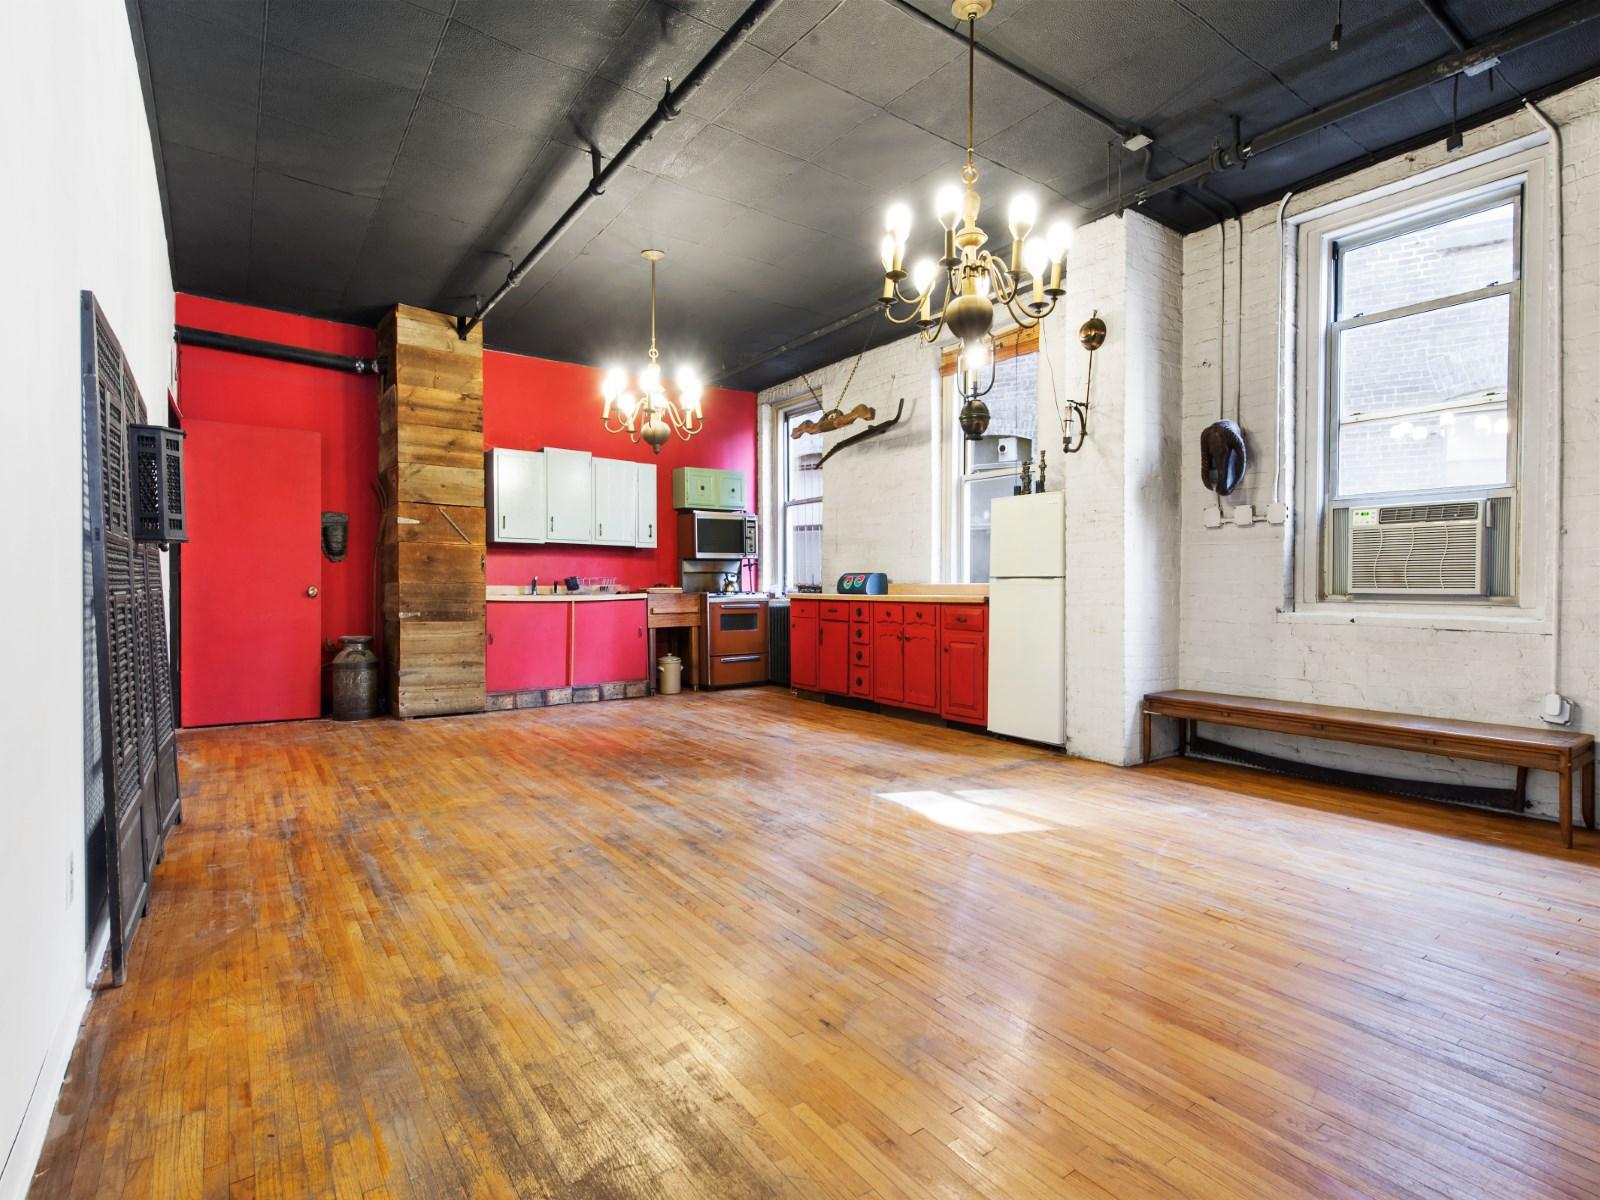 34 West 13th Street, cool listings, Quad Cinema, Lofts for Sale, Greenwich Village, Village Loft,